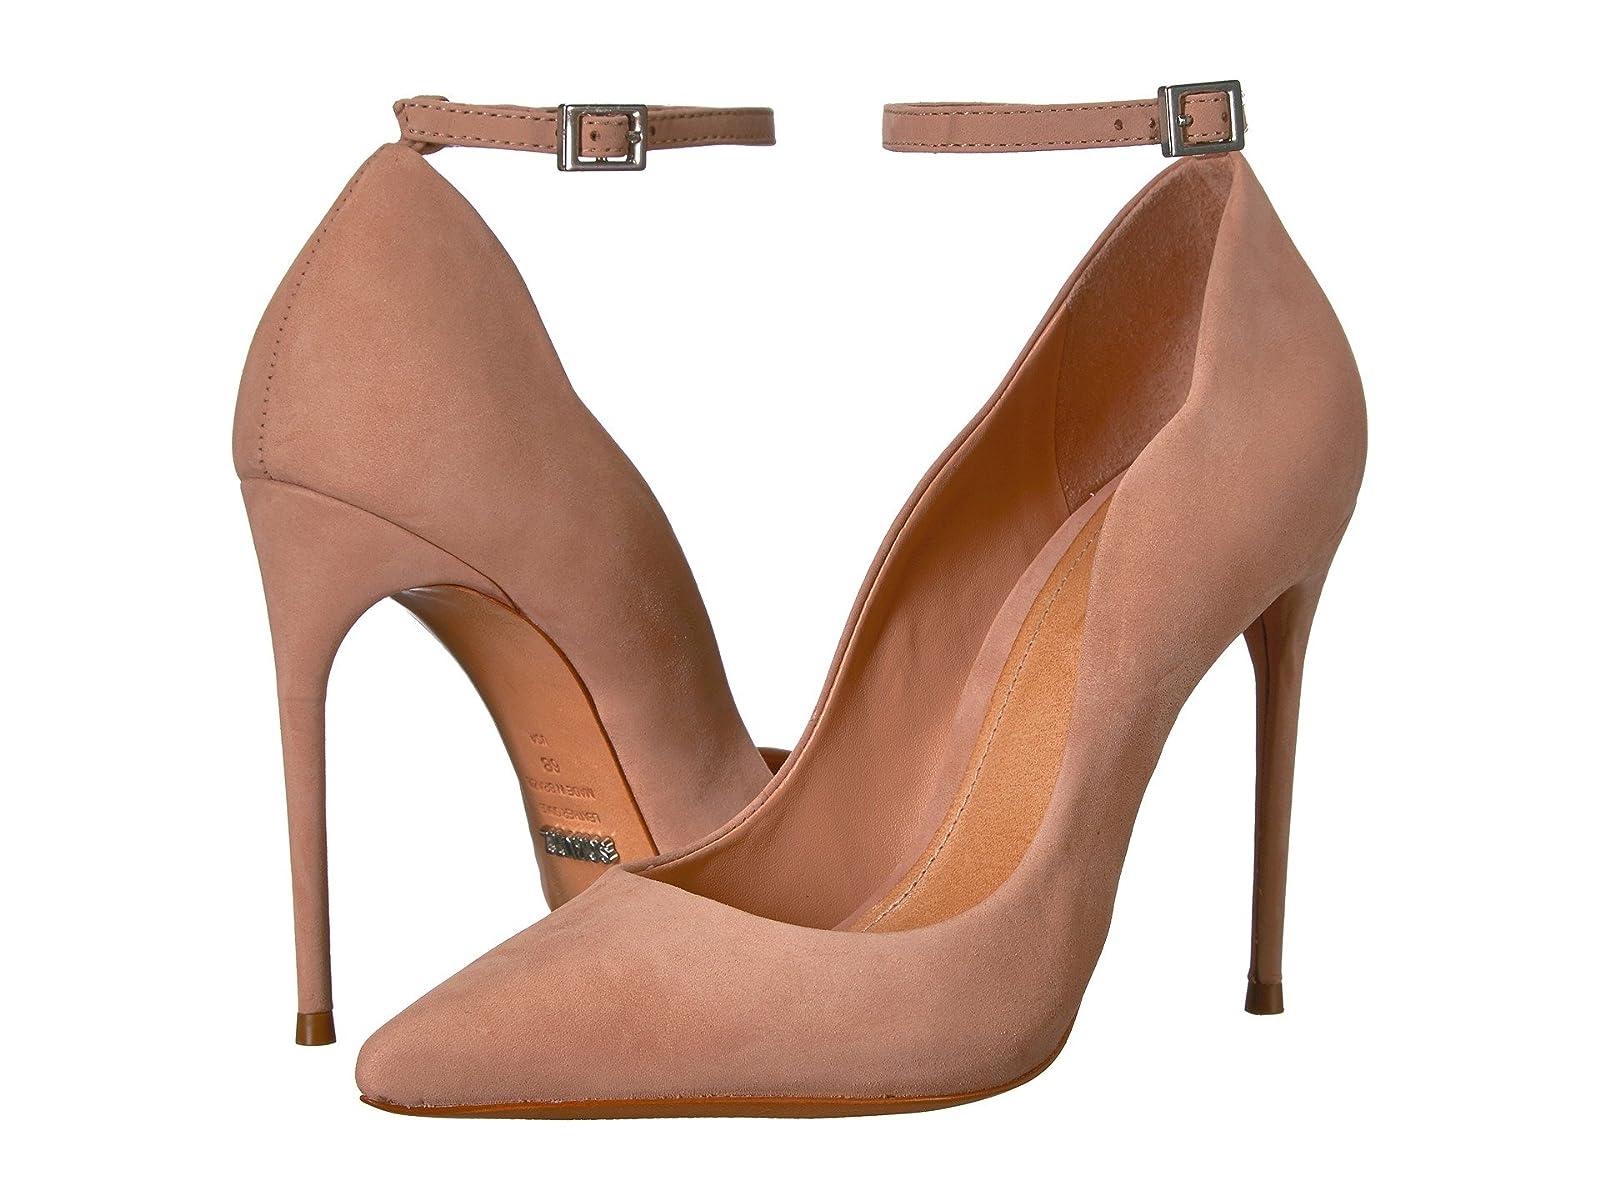 Schutz ThaynaraAtmospheric grades have affordable shoes